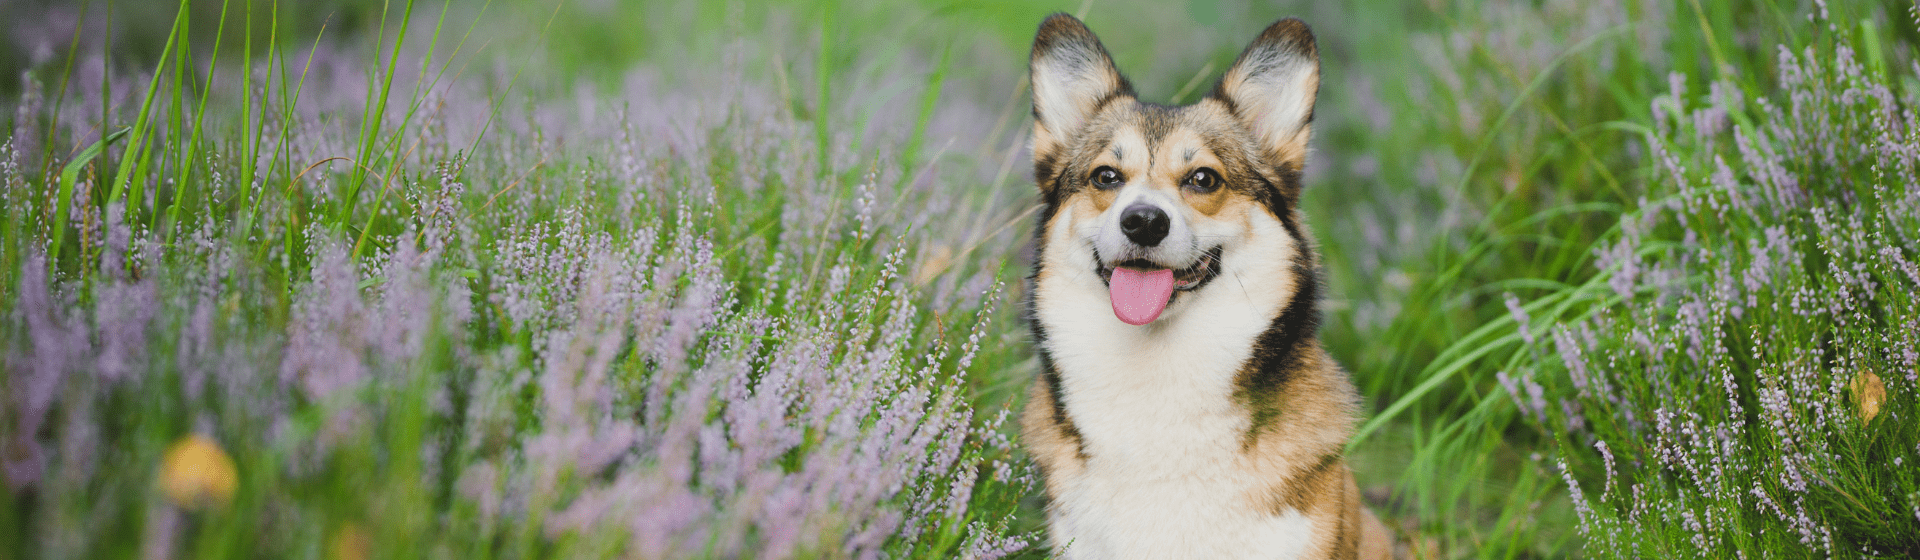 10 produtos para cachorro que todo dono deve ter